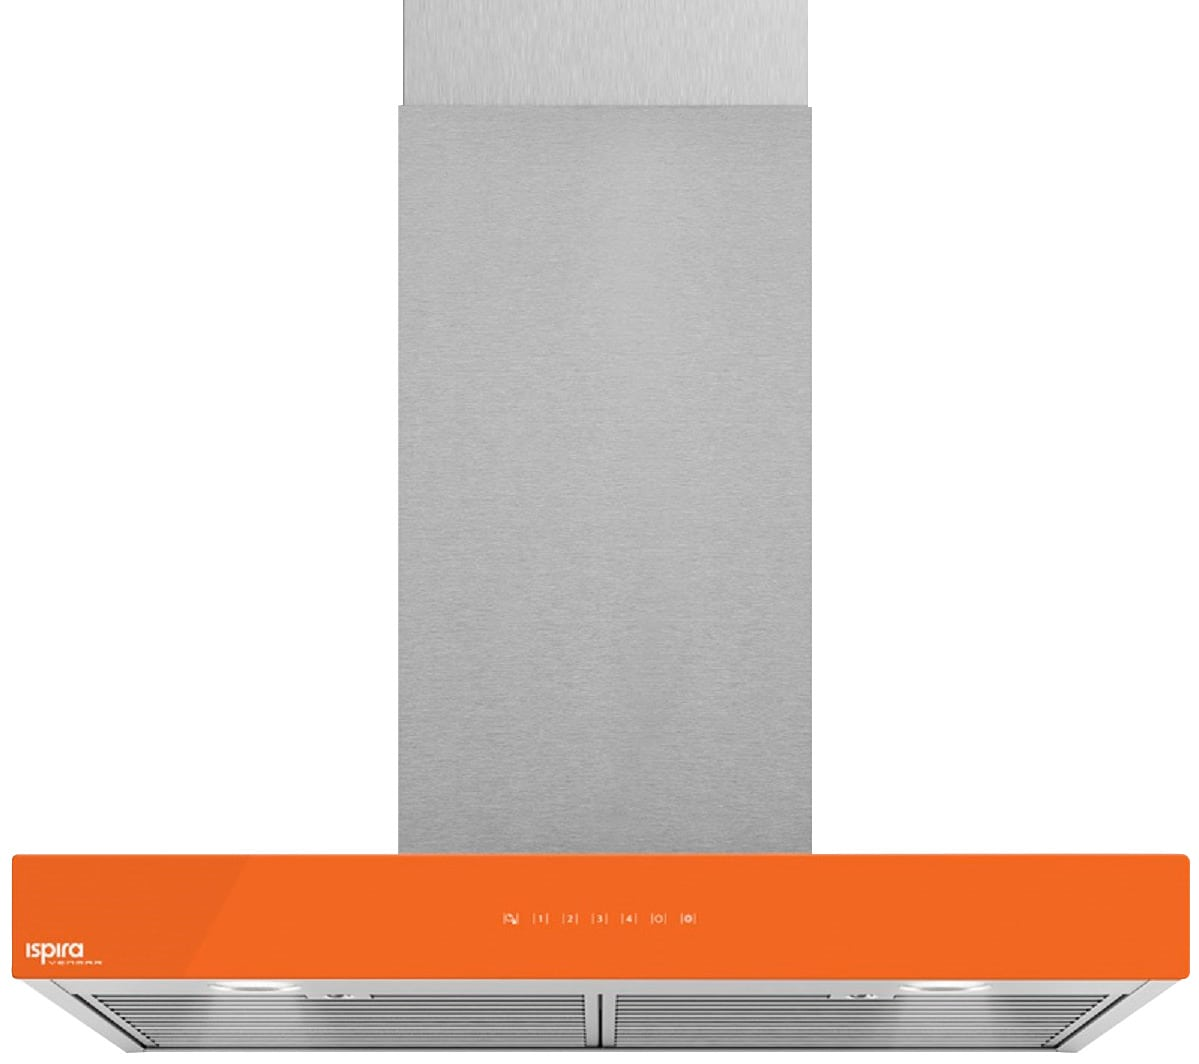 "Venmar Ispira 30"" Chimney Range Hood – Orange"